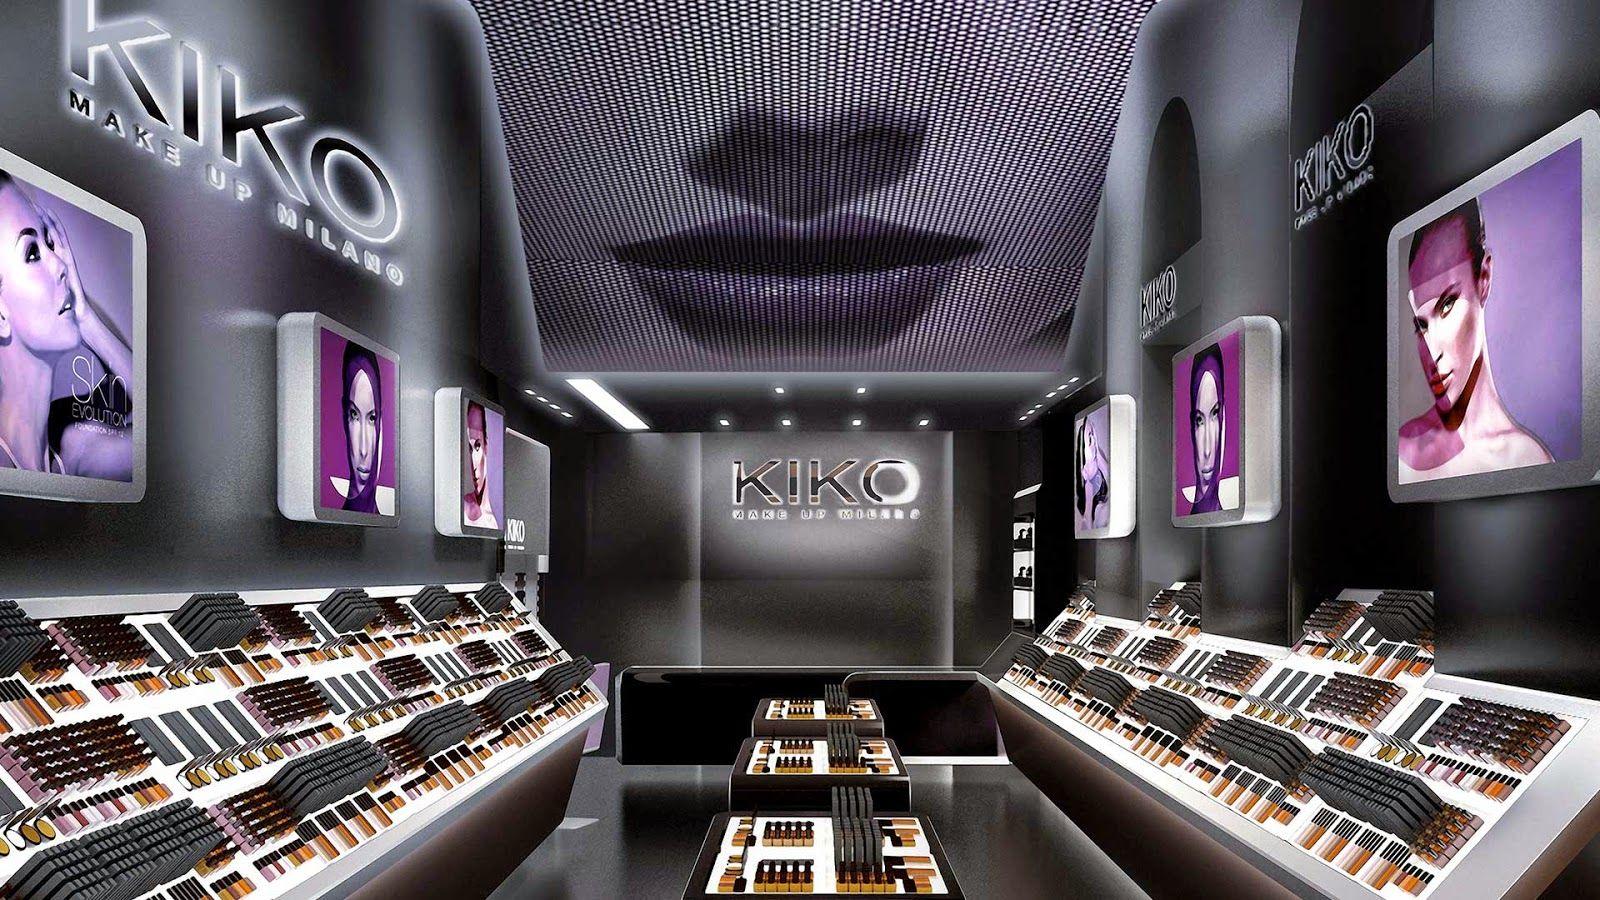 kiko milano barcelona Kiko cosmetics, Kiko, Kiko milano